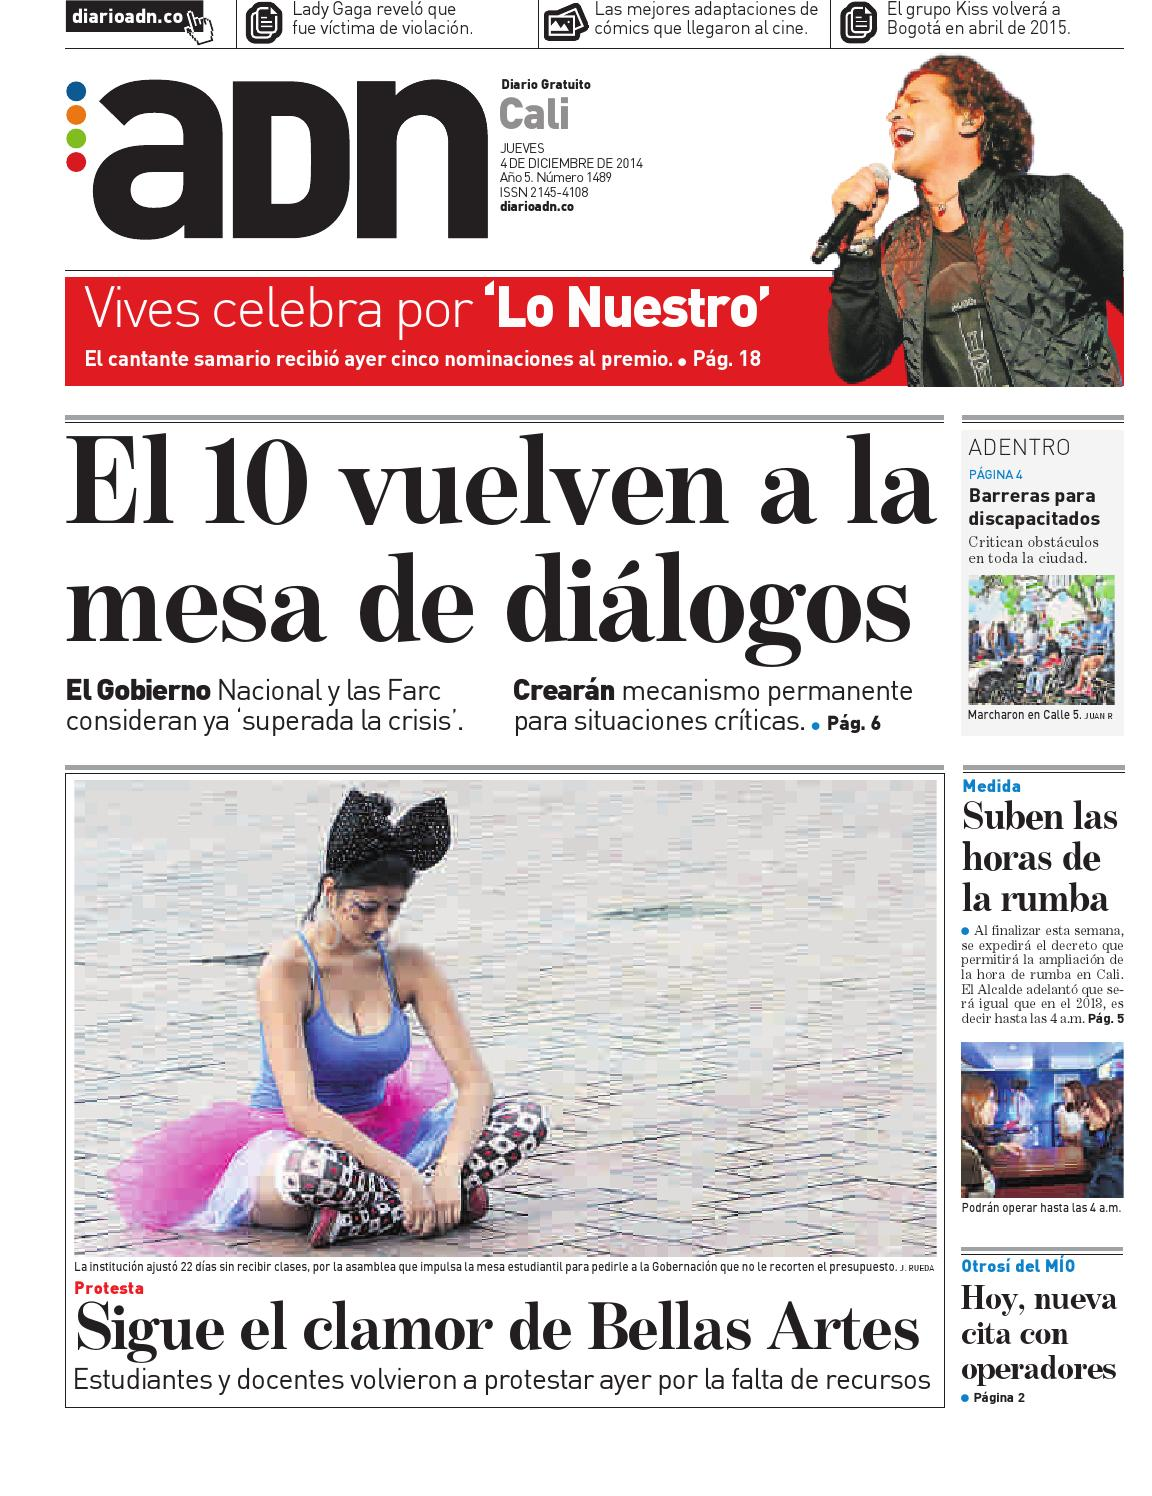 4 de diciembre Cali by Diario ADN - issuu